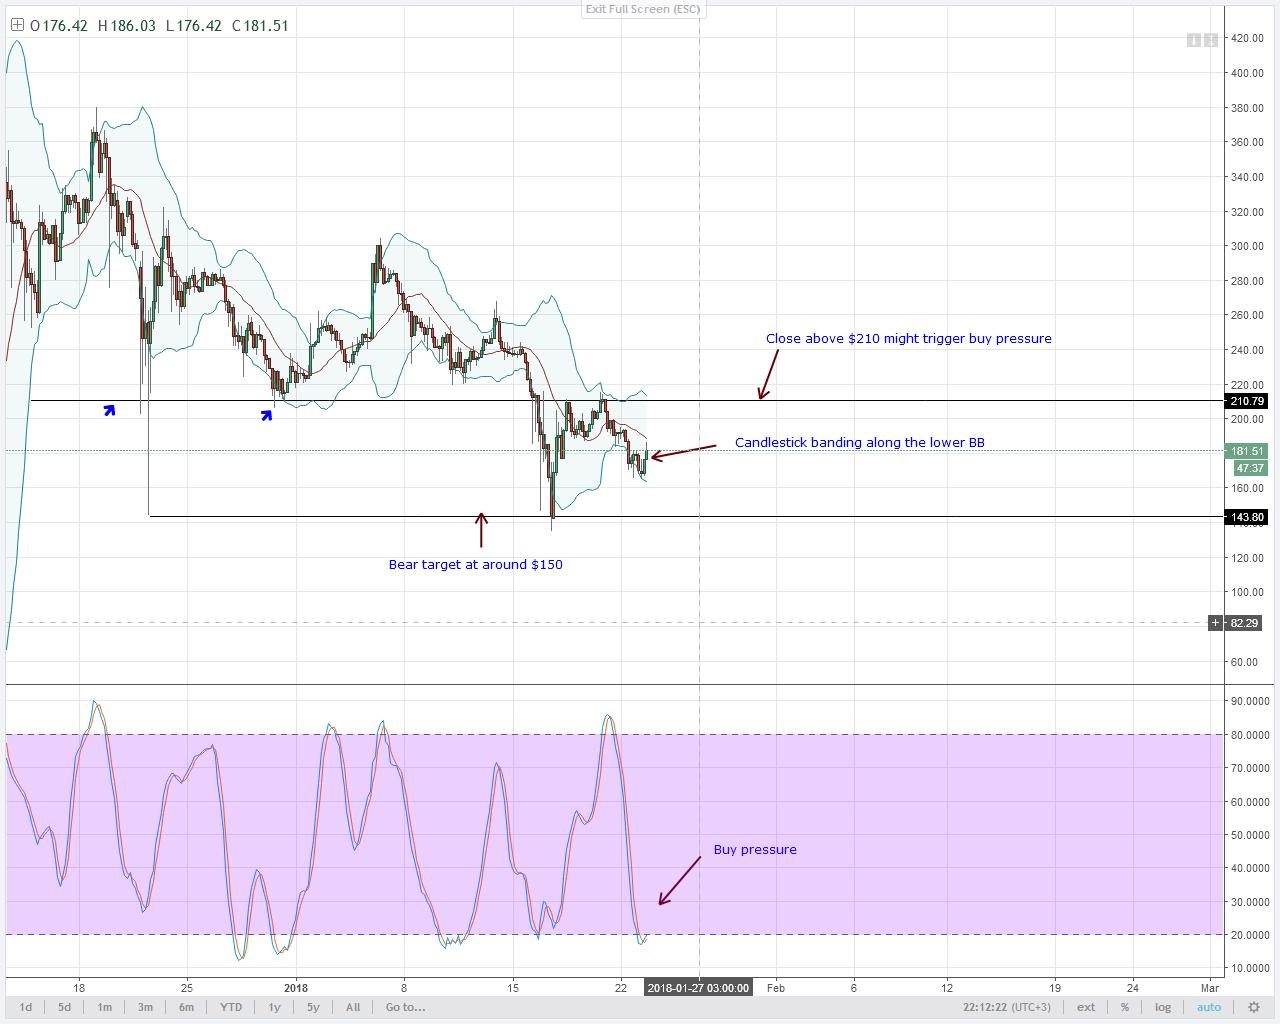 altcoin analysis LTC buy pressure